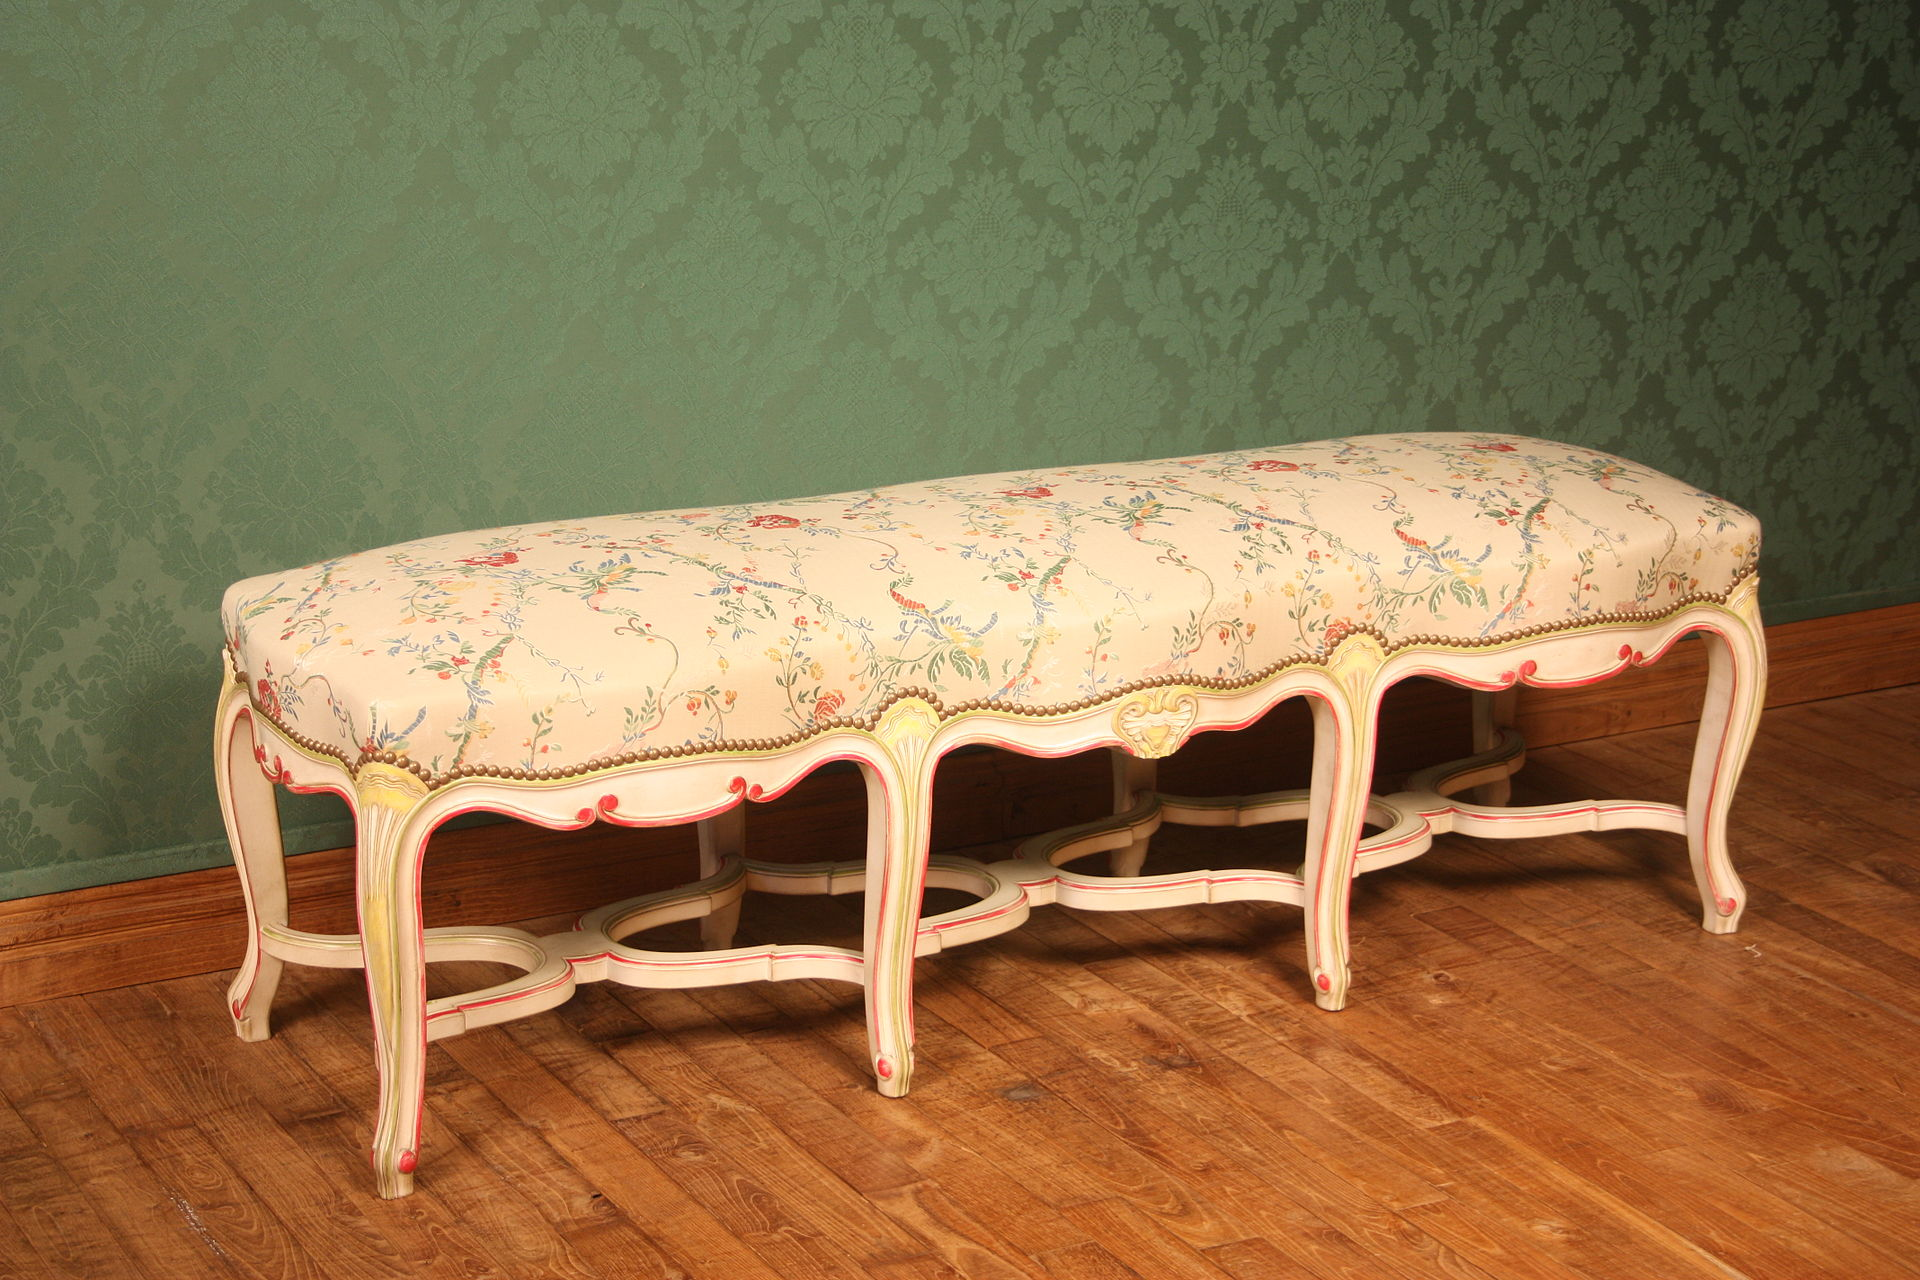 banquette wiktionnaire. Black Bedroom Furniture Sets. Home Design Ideas